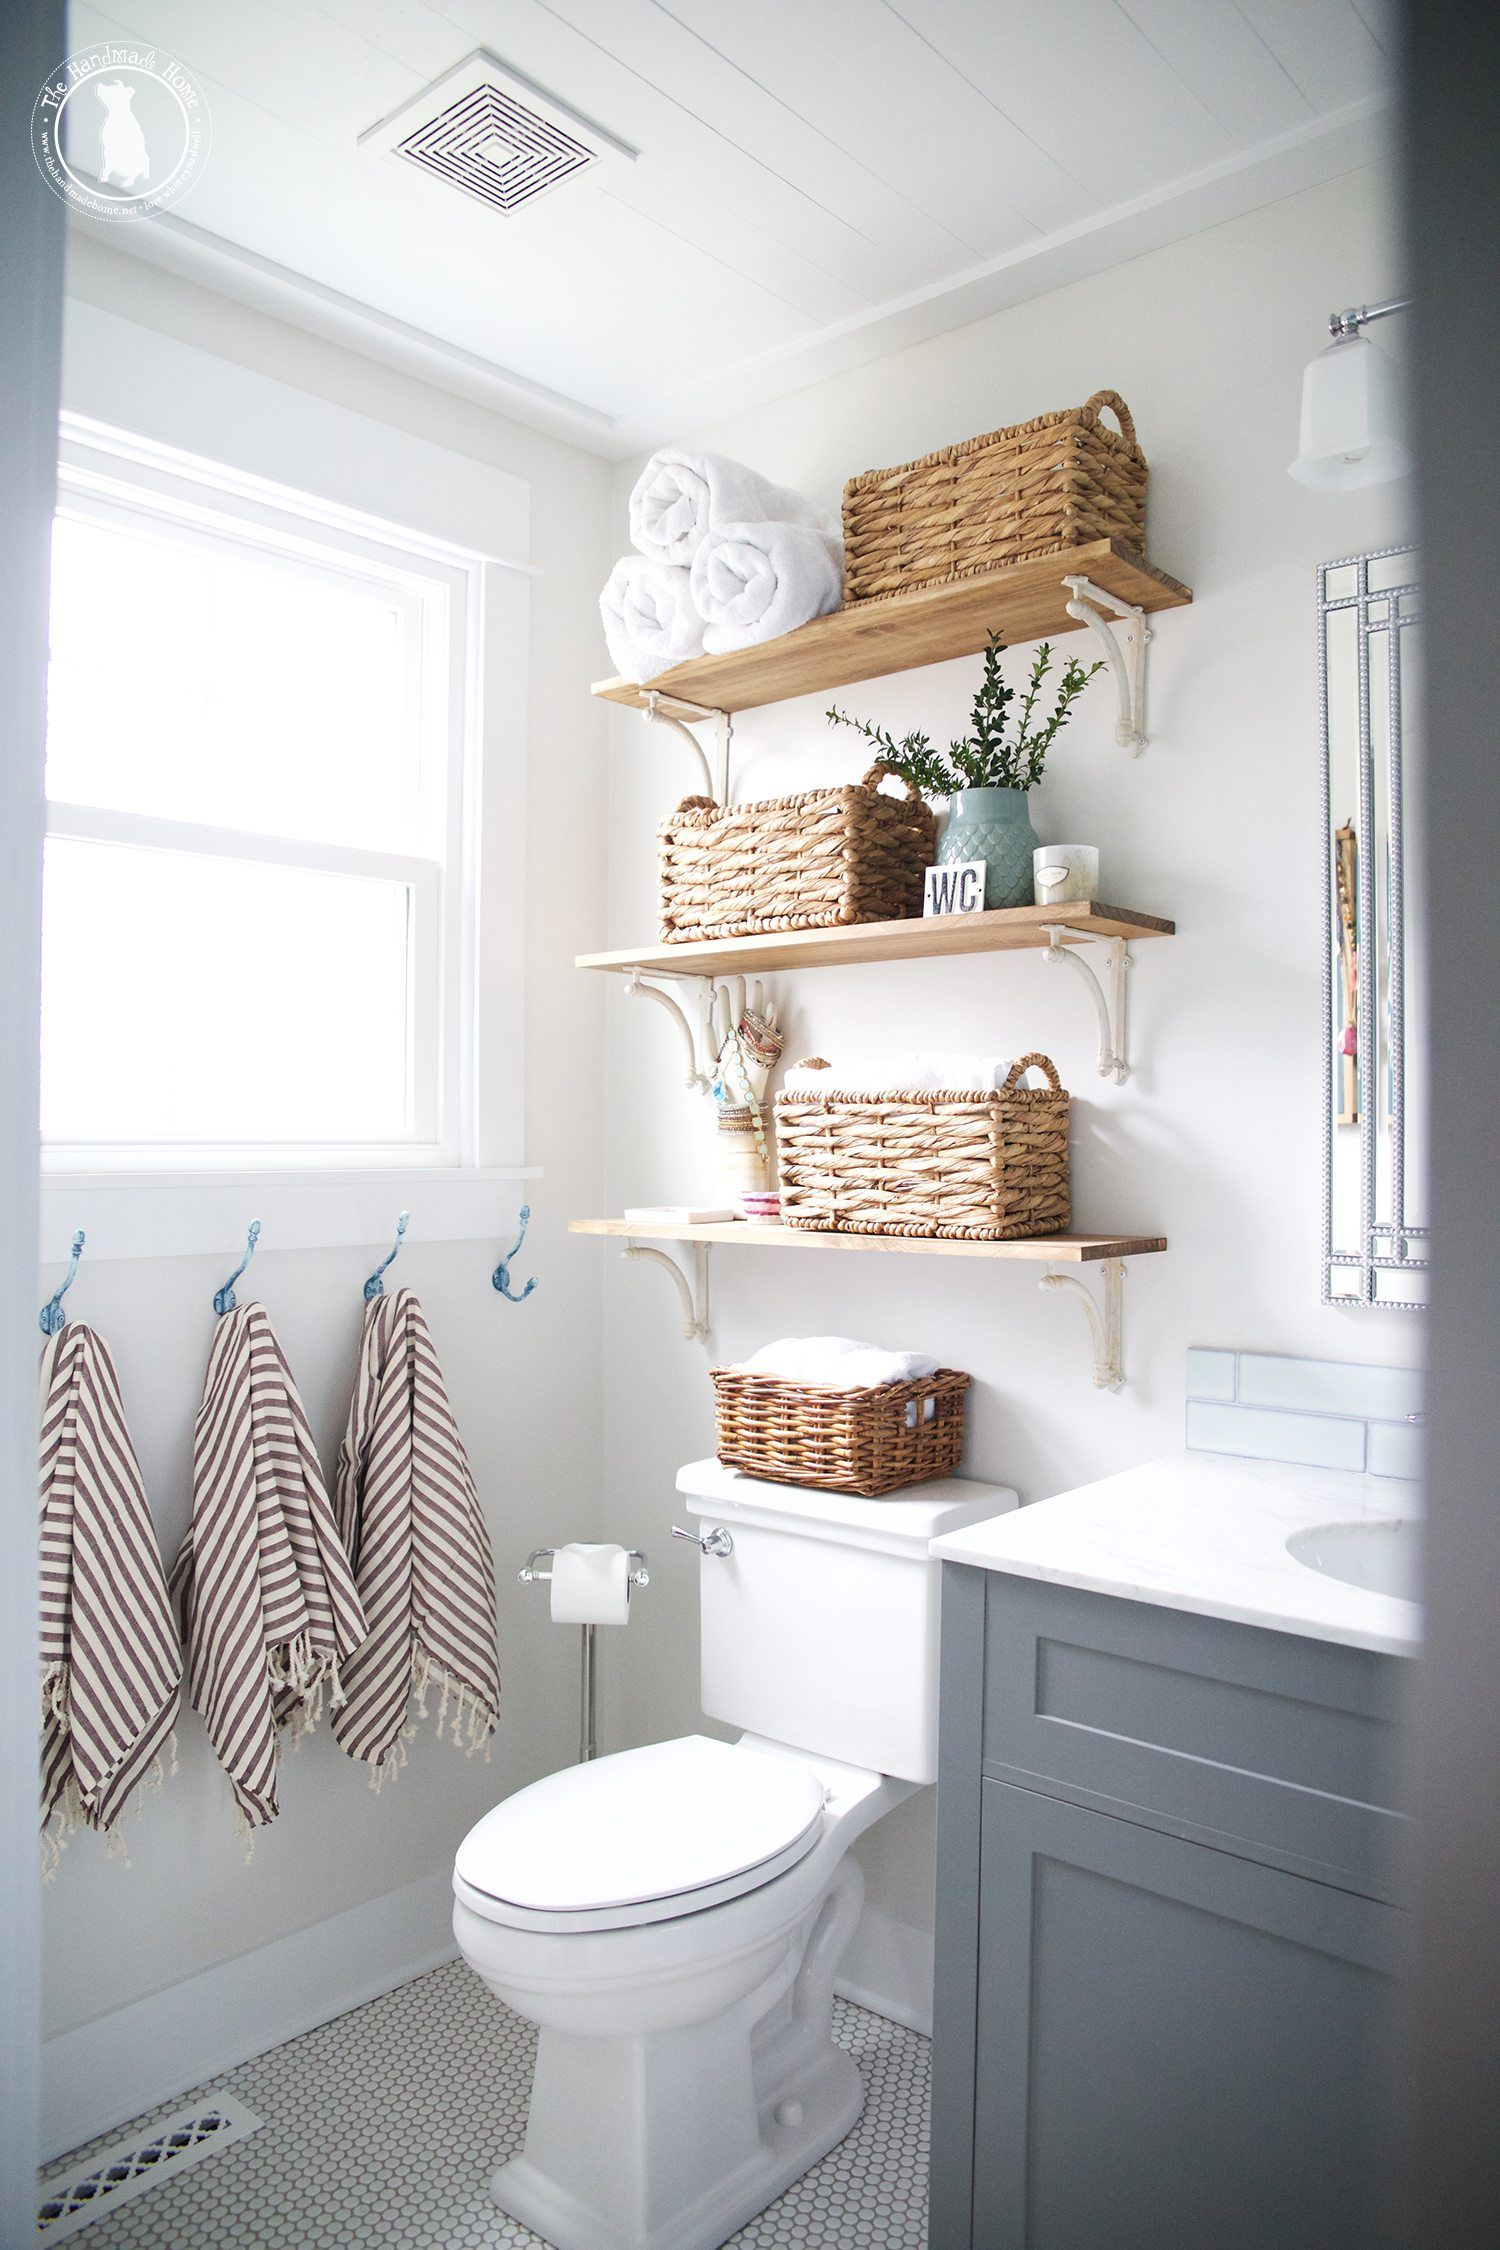 attic lighting ideas. 15+ Dreamy Bathroom Lighting Ideas Attic R